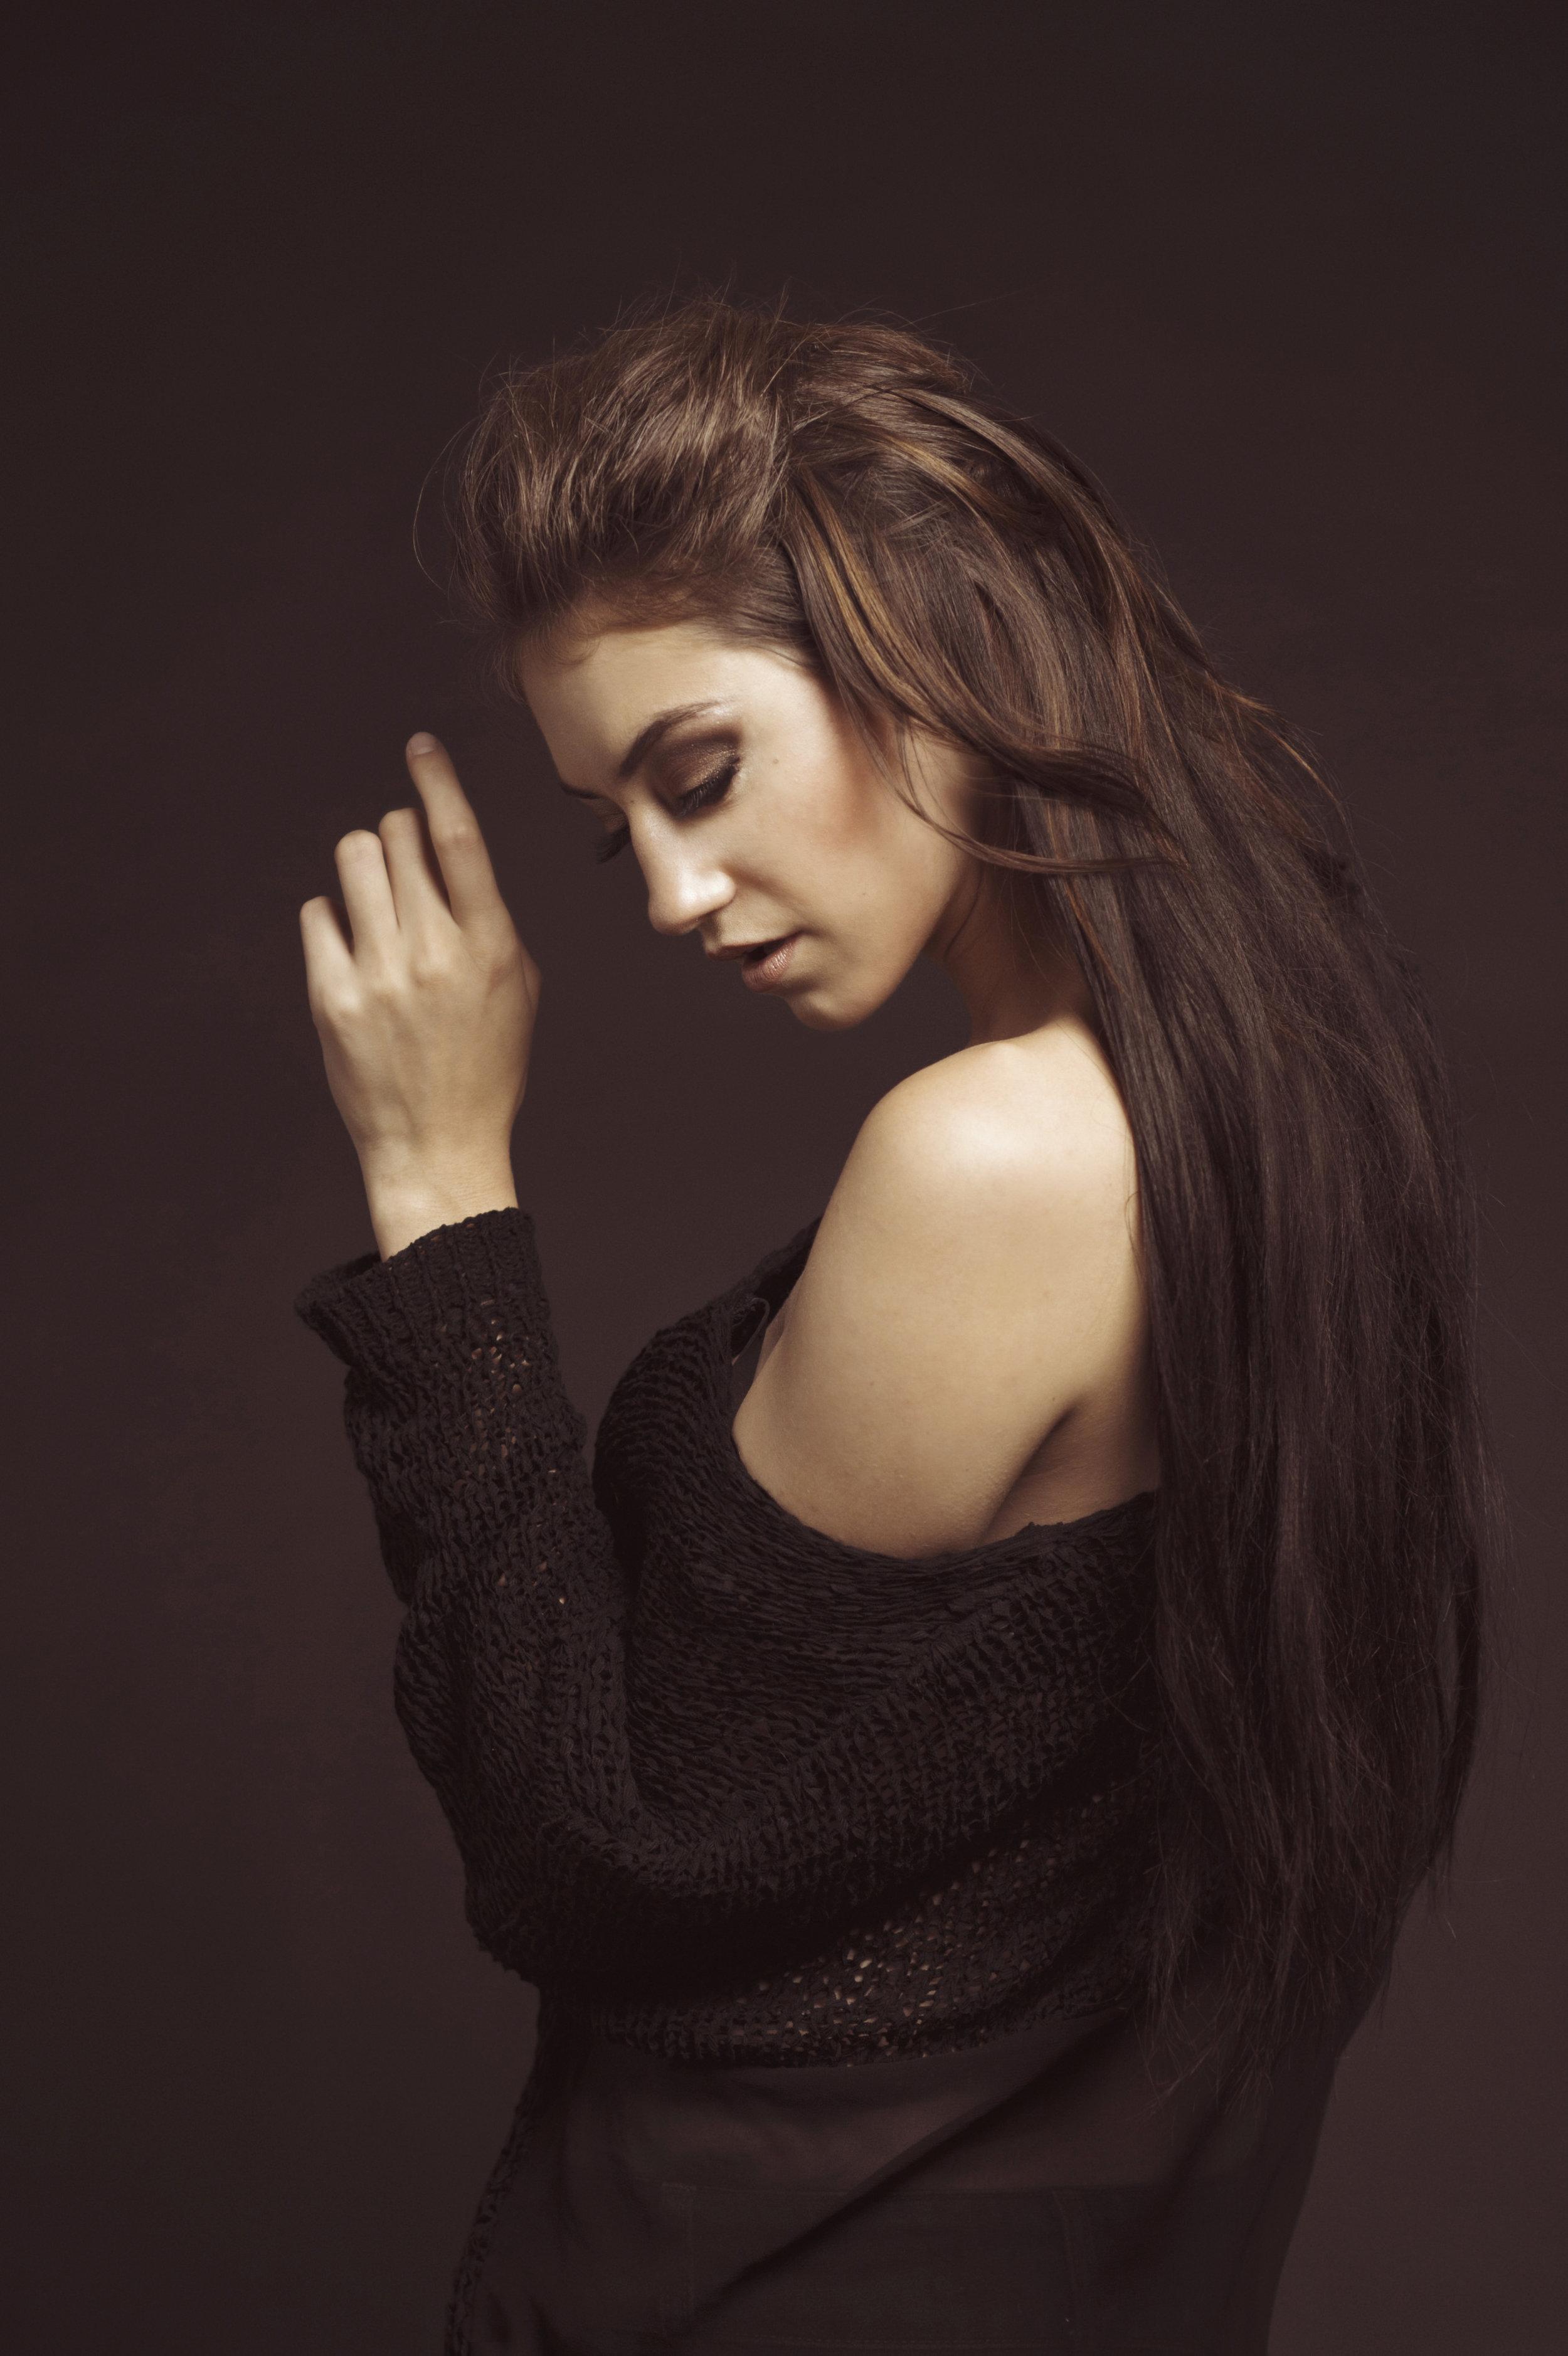 marta-hewson-maggie-taylor-woman-with-long-brown-hair.jpg